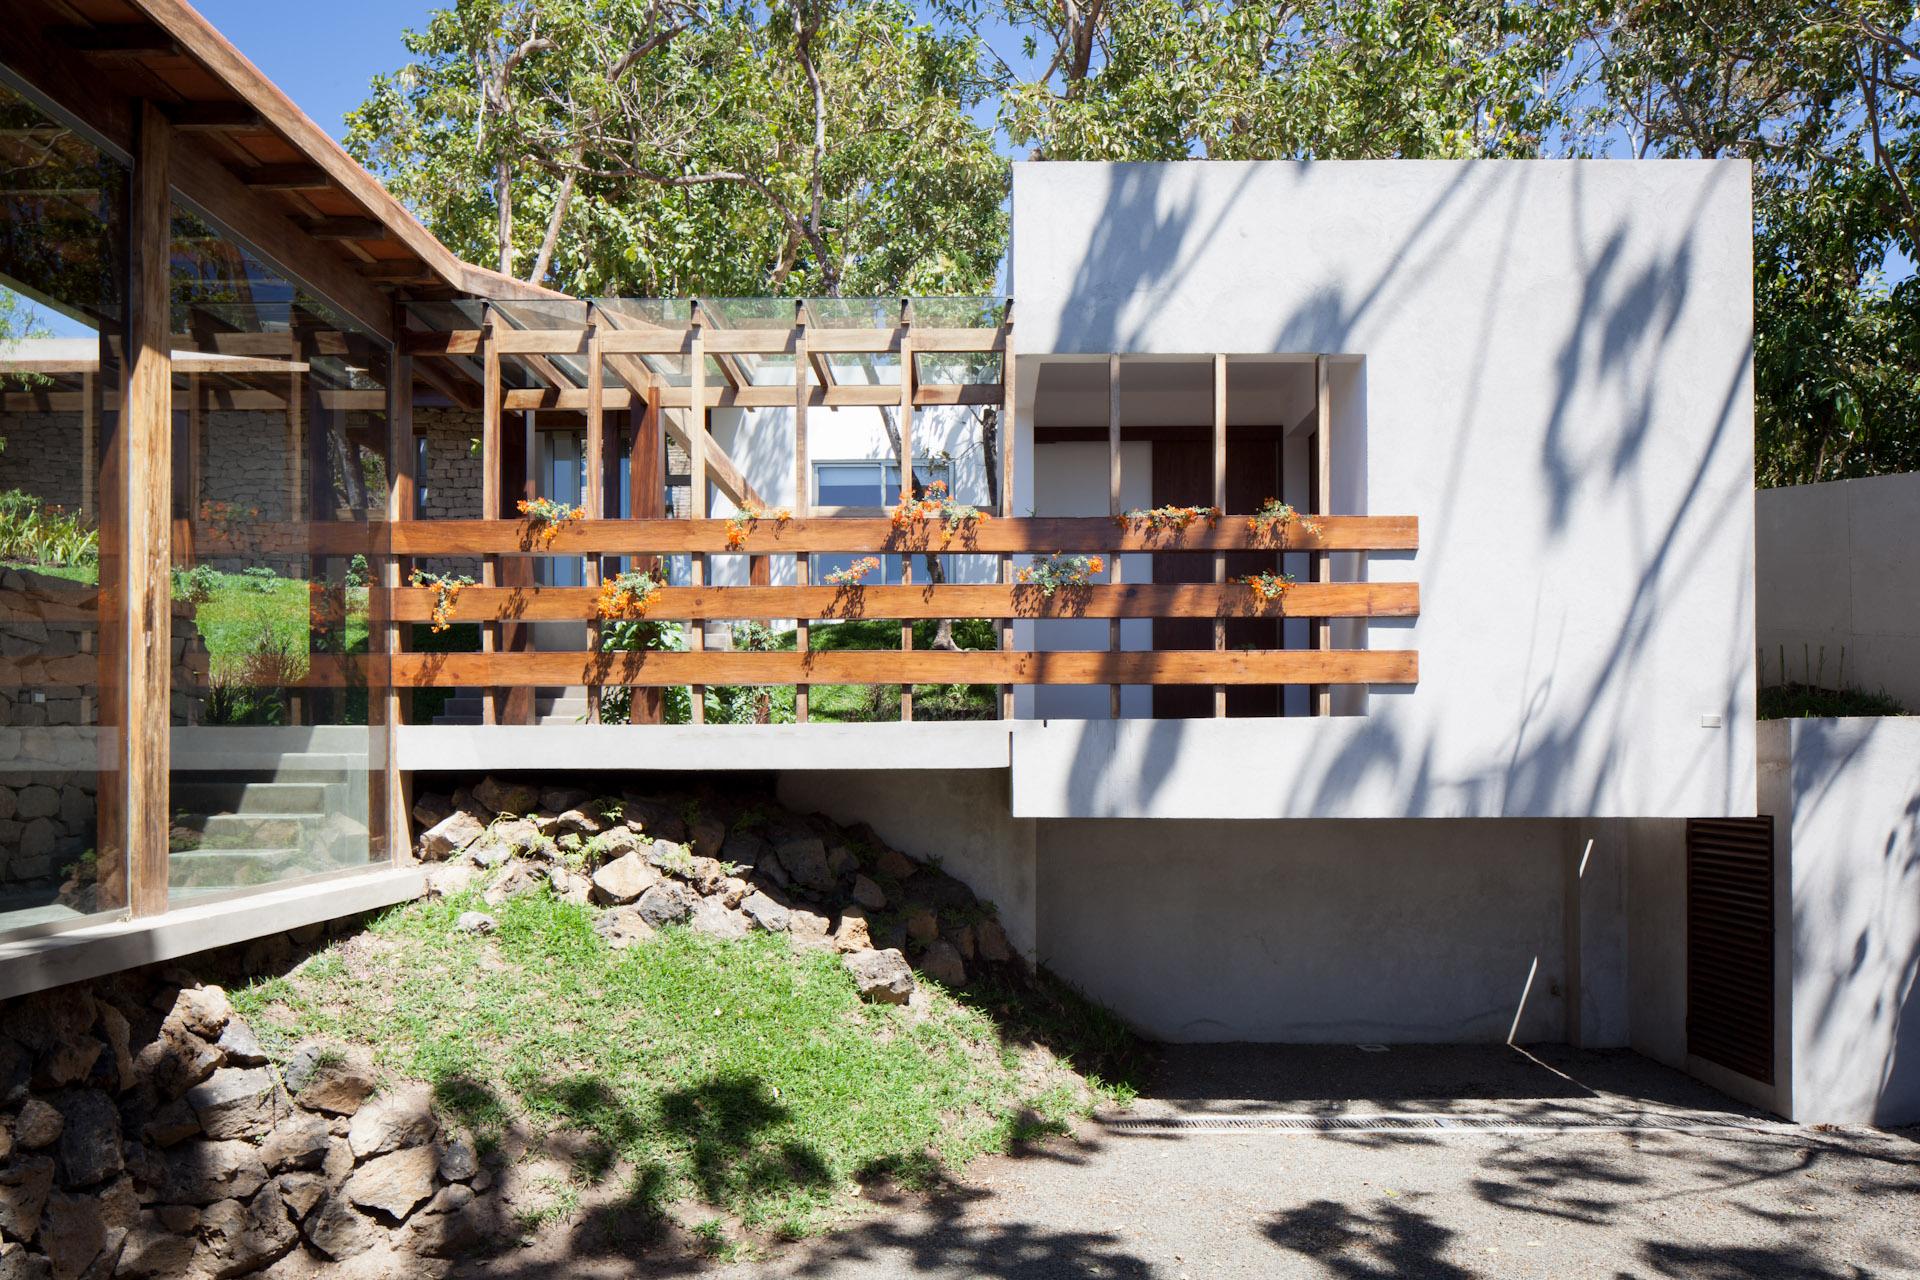 Architecture-Modern-Casa-Jardin-El-Salvador-Jason-Bax-04.JPG